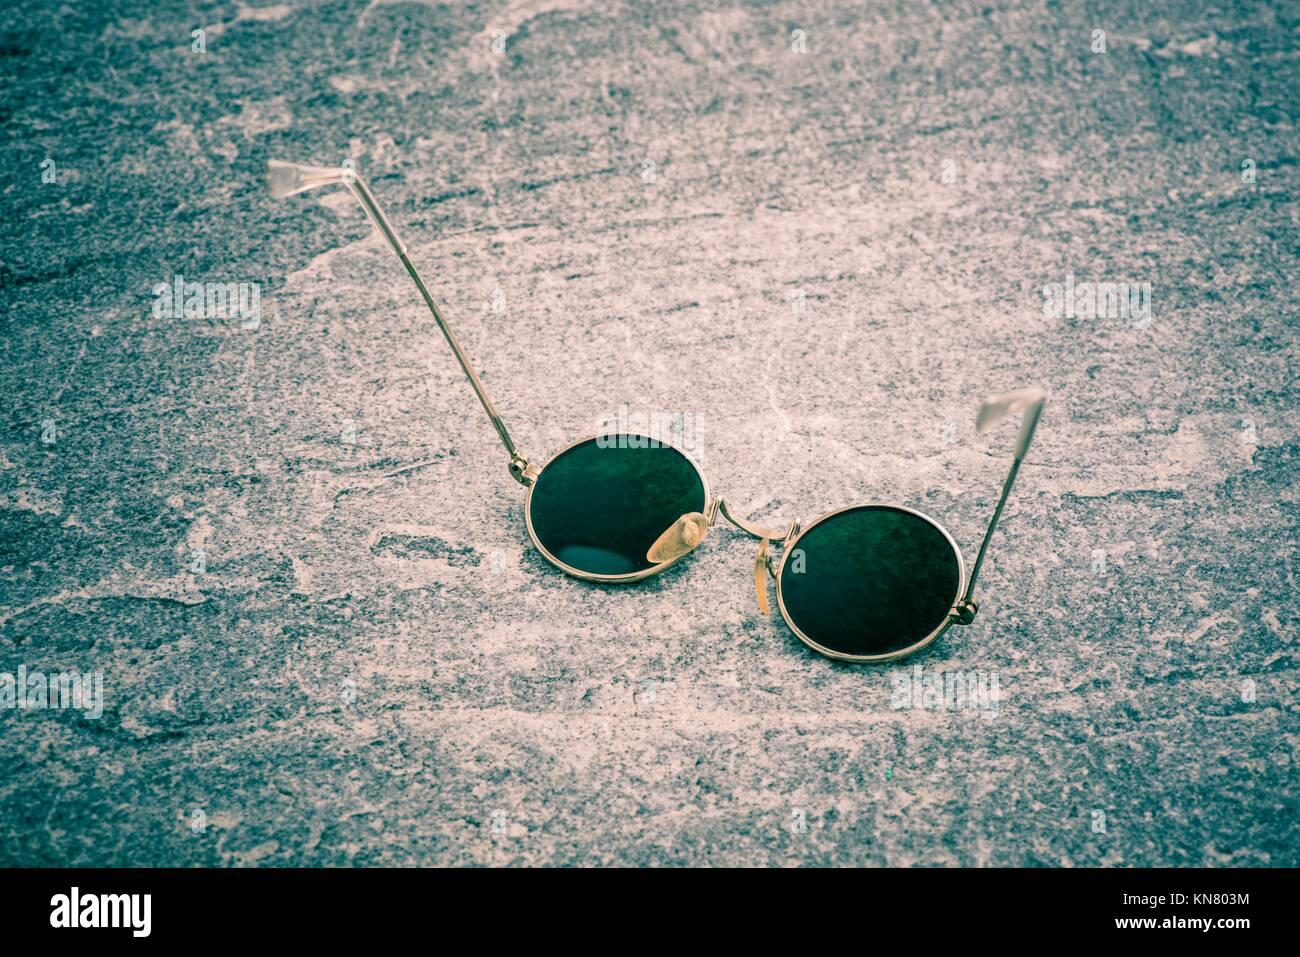 Round sunglasses on stone table, Retro eyewear. Still life of cool design accessory. - Stock Image